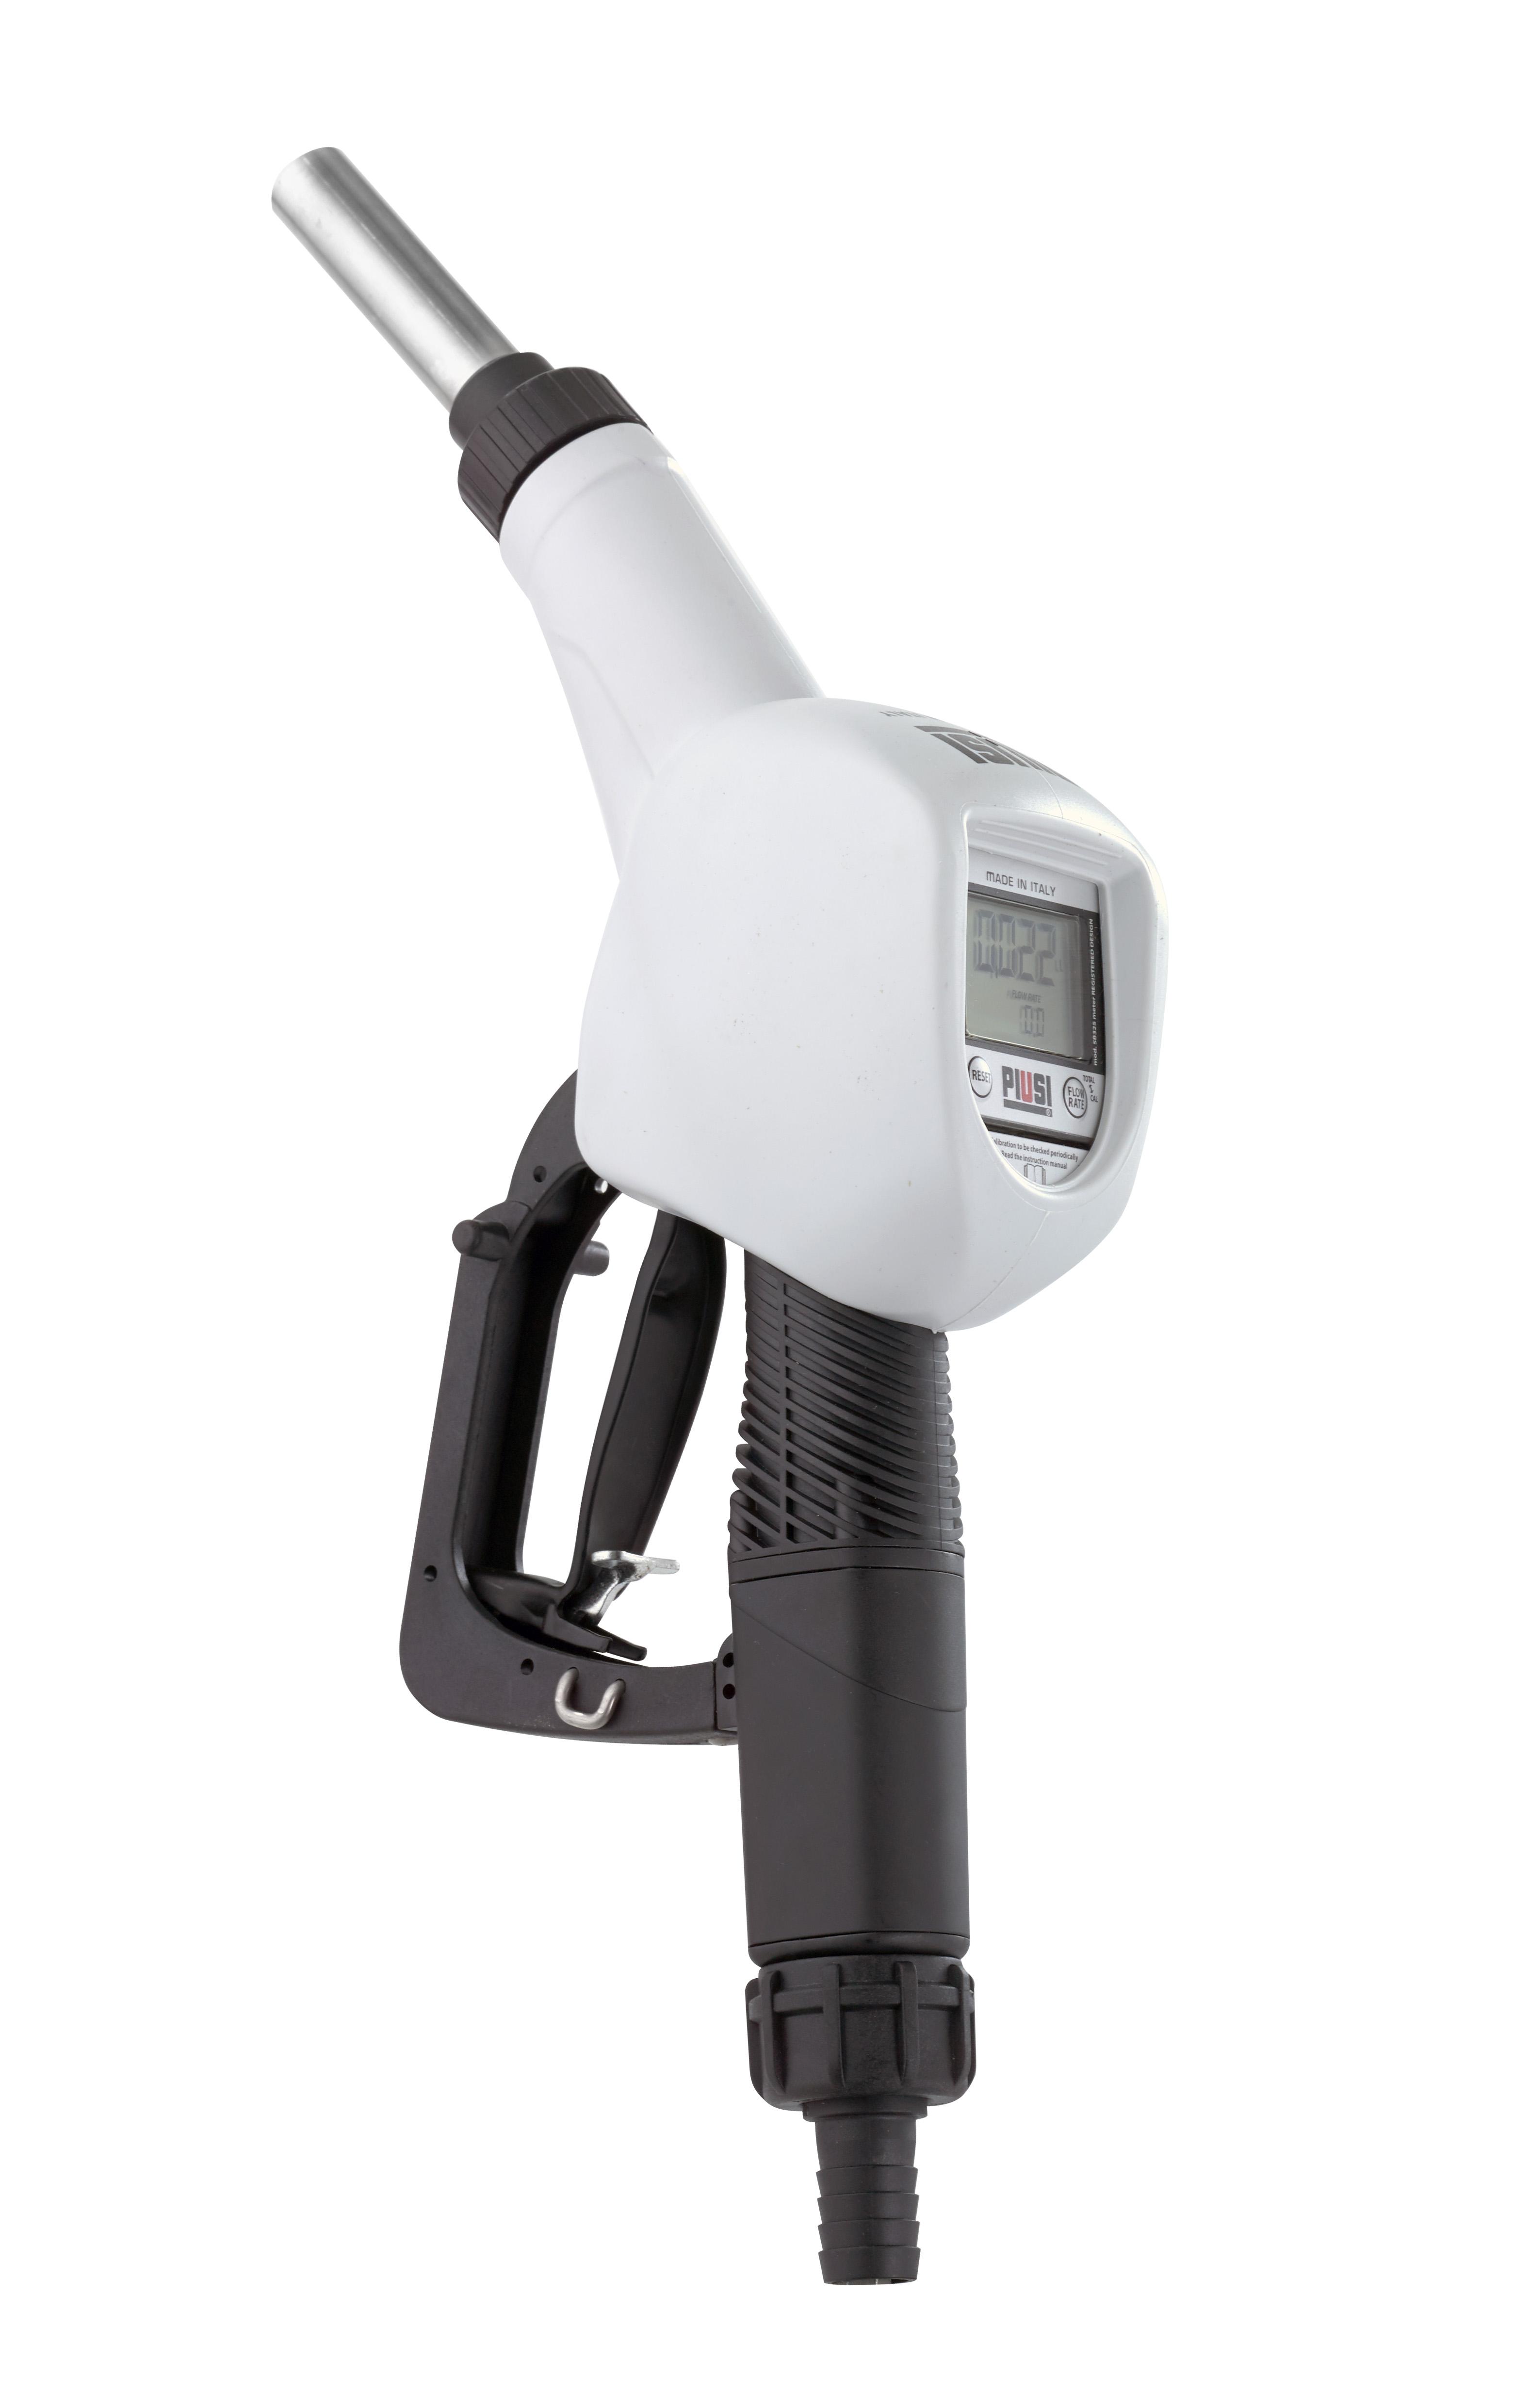 KRUSE Automatic pump nozzle with flowmeter